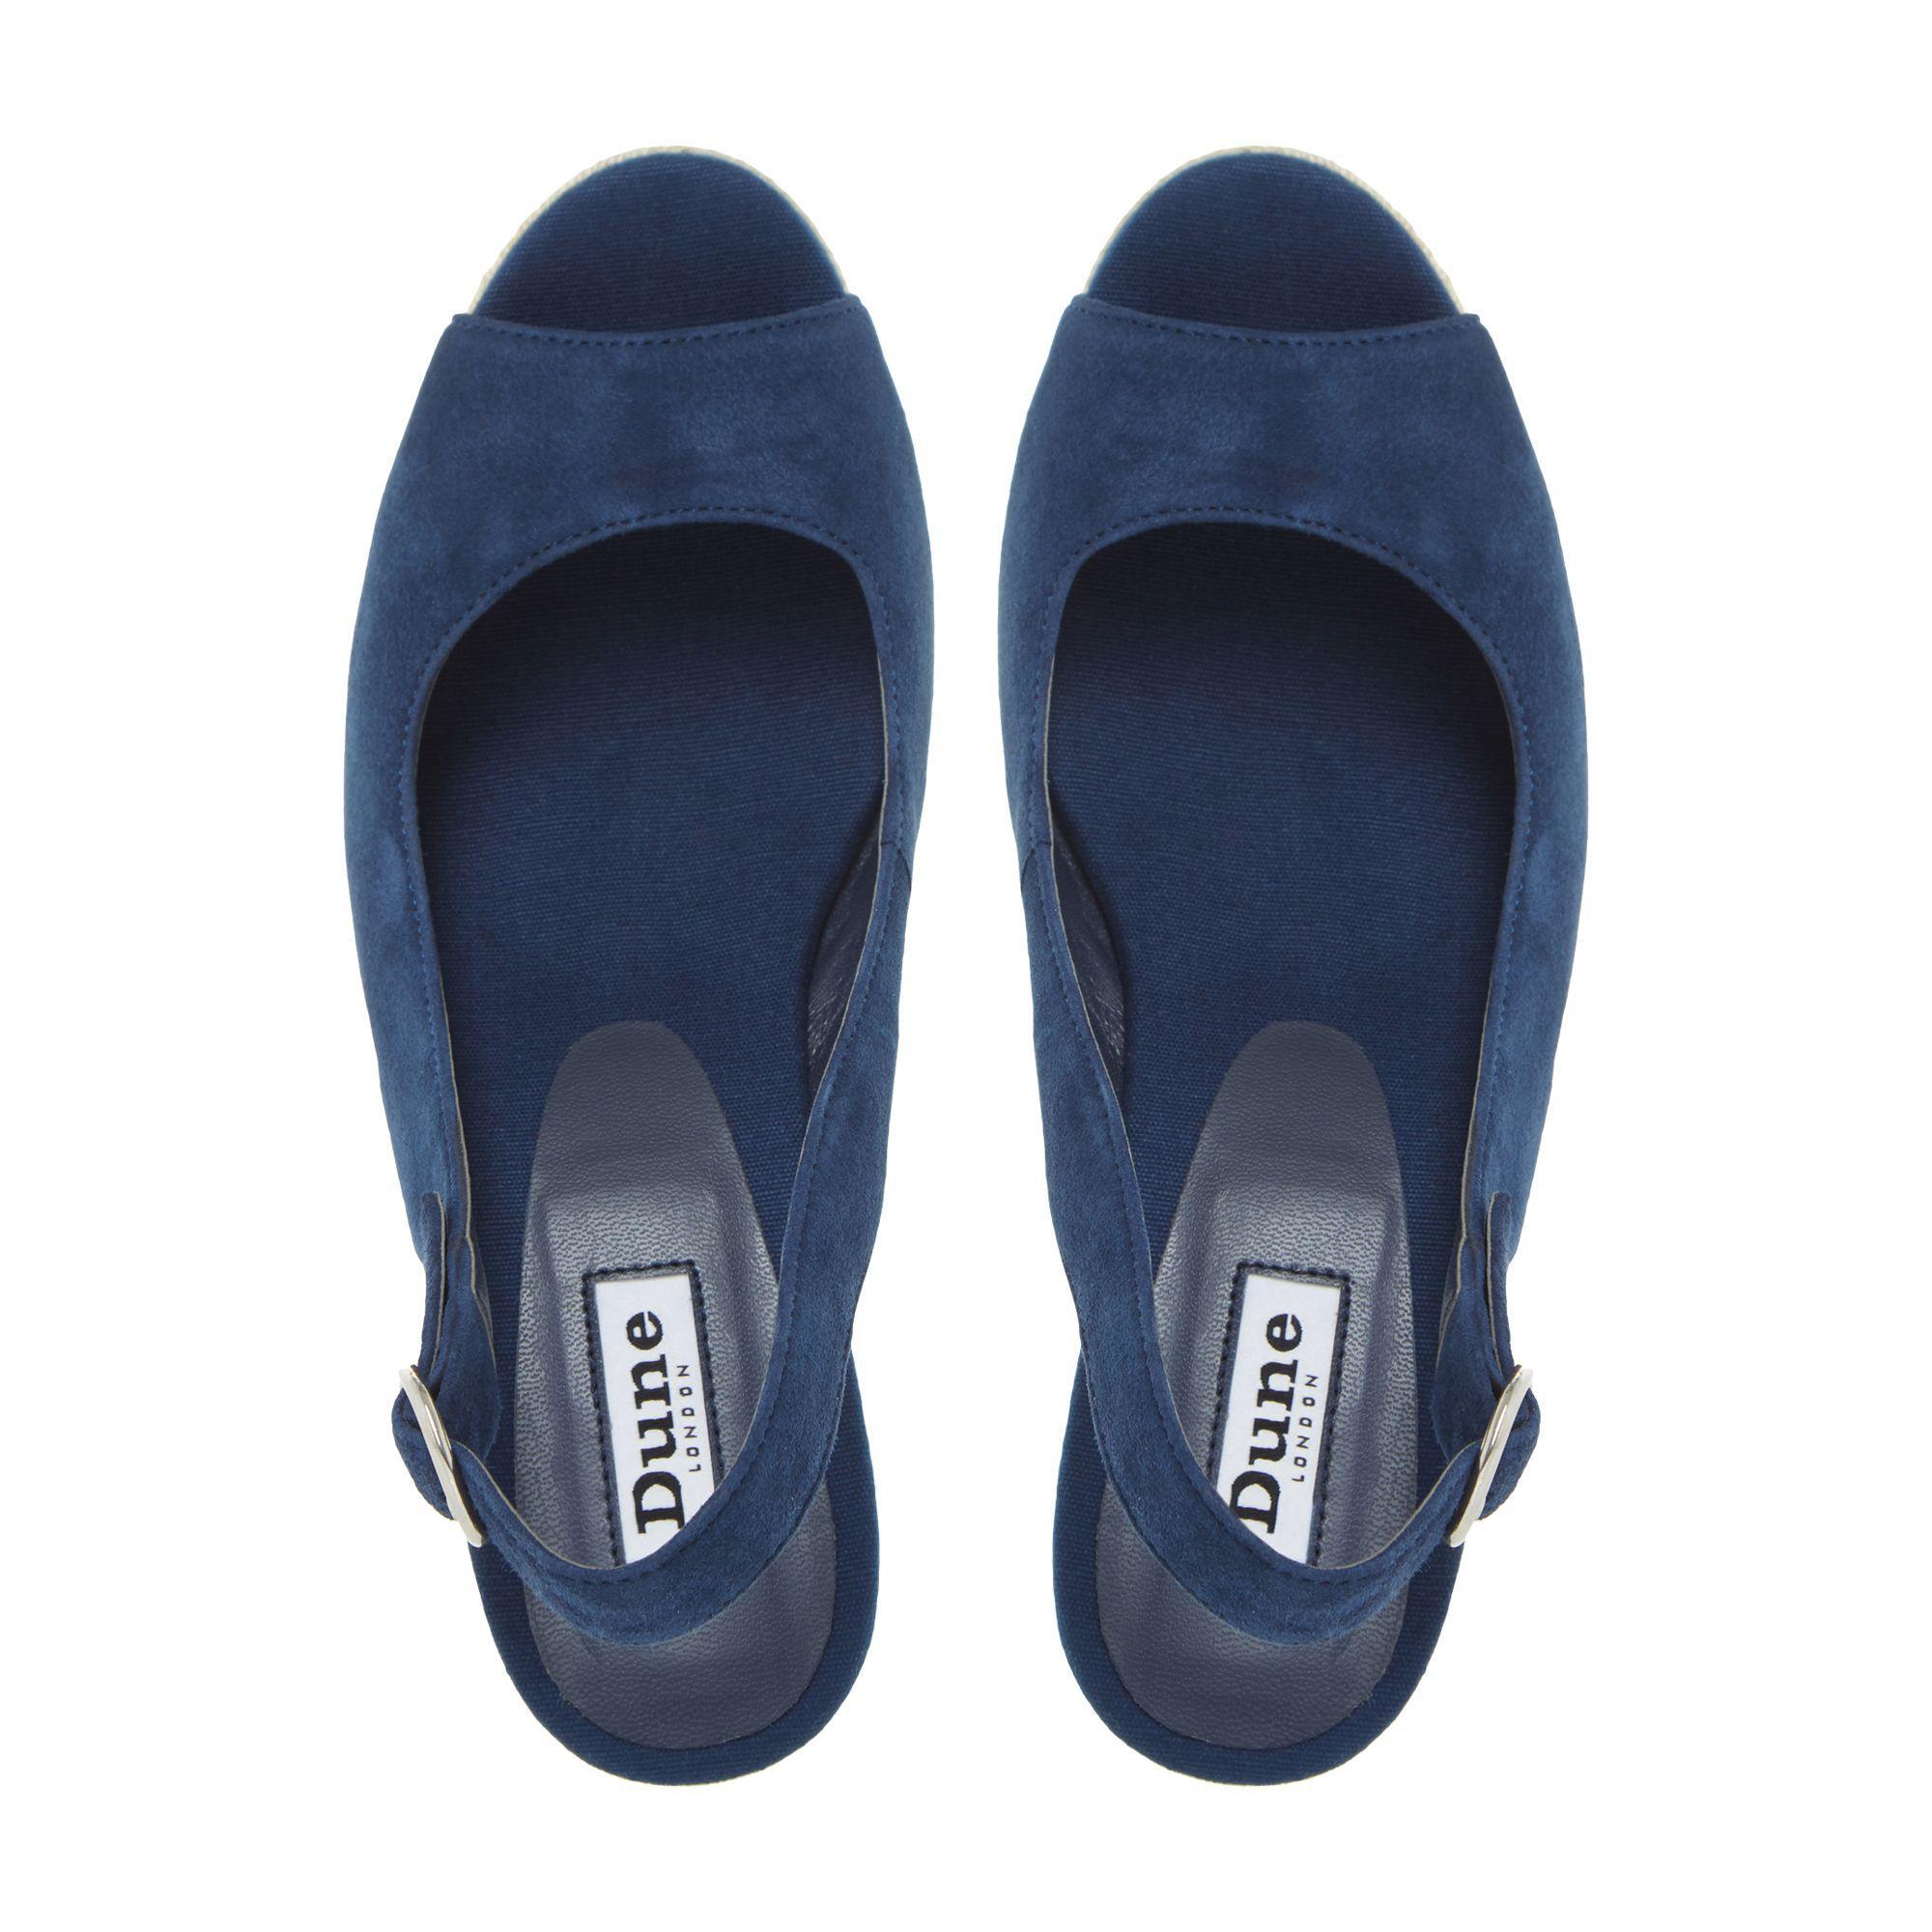 5be8f5013207 ...  klick  Espadrille Trim Wedge Sandals - Lyst. View fullscreen